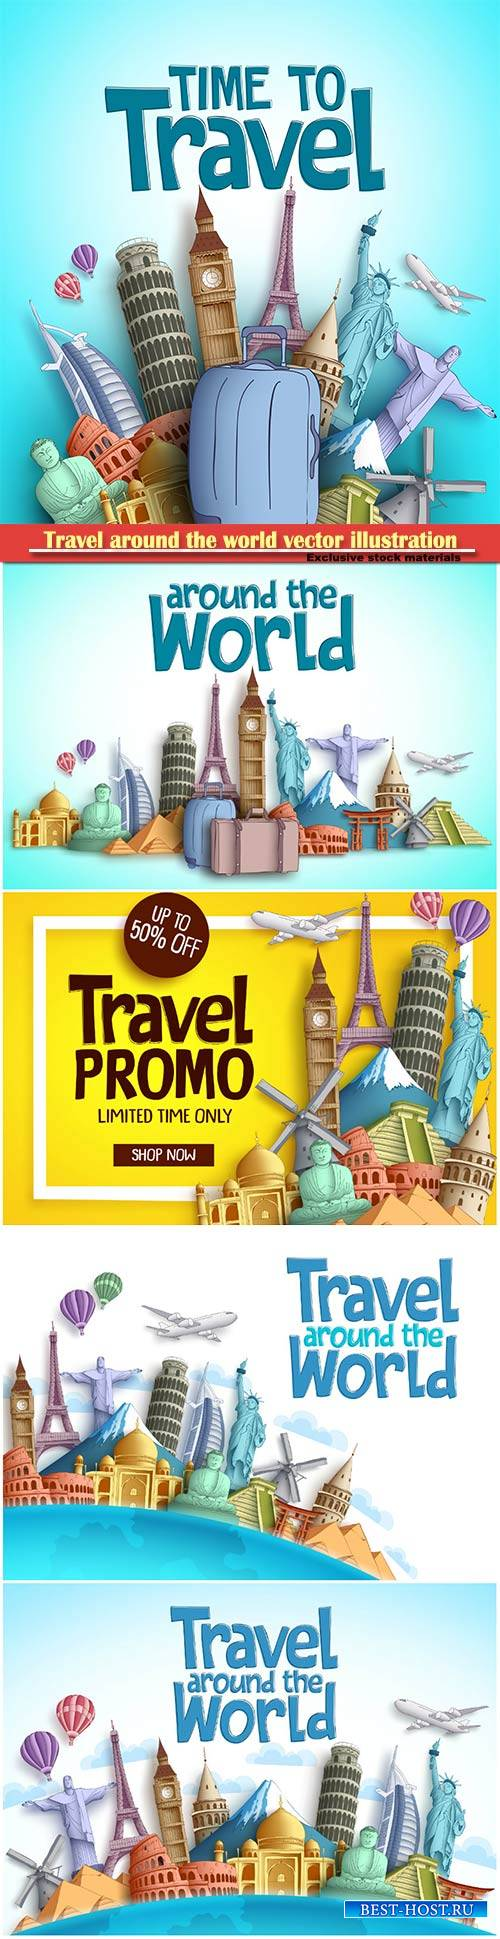 Travel around the world vector illustration